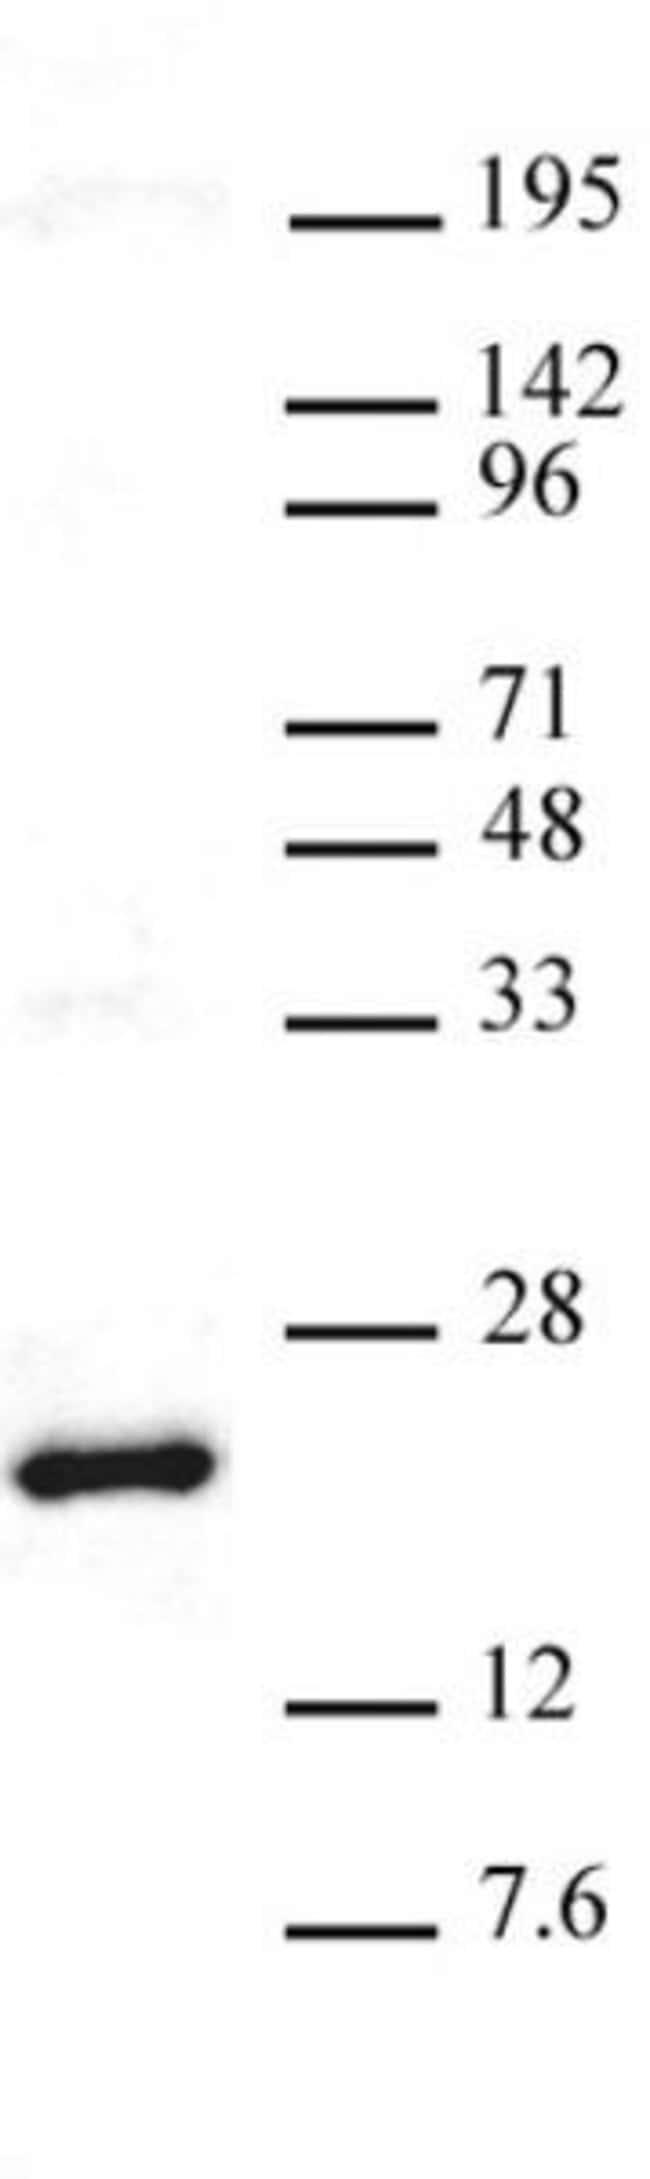 Histone H3K27me3 Rabbit anti-Human, Active Motif:Antibodies:Primary Antibodies